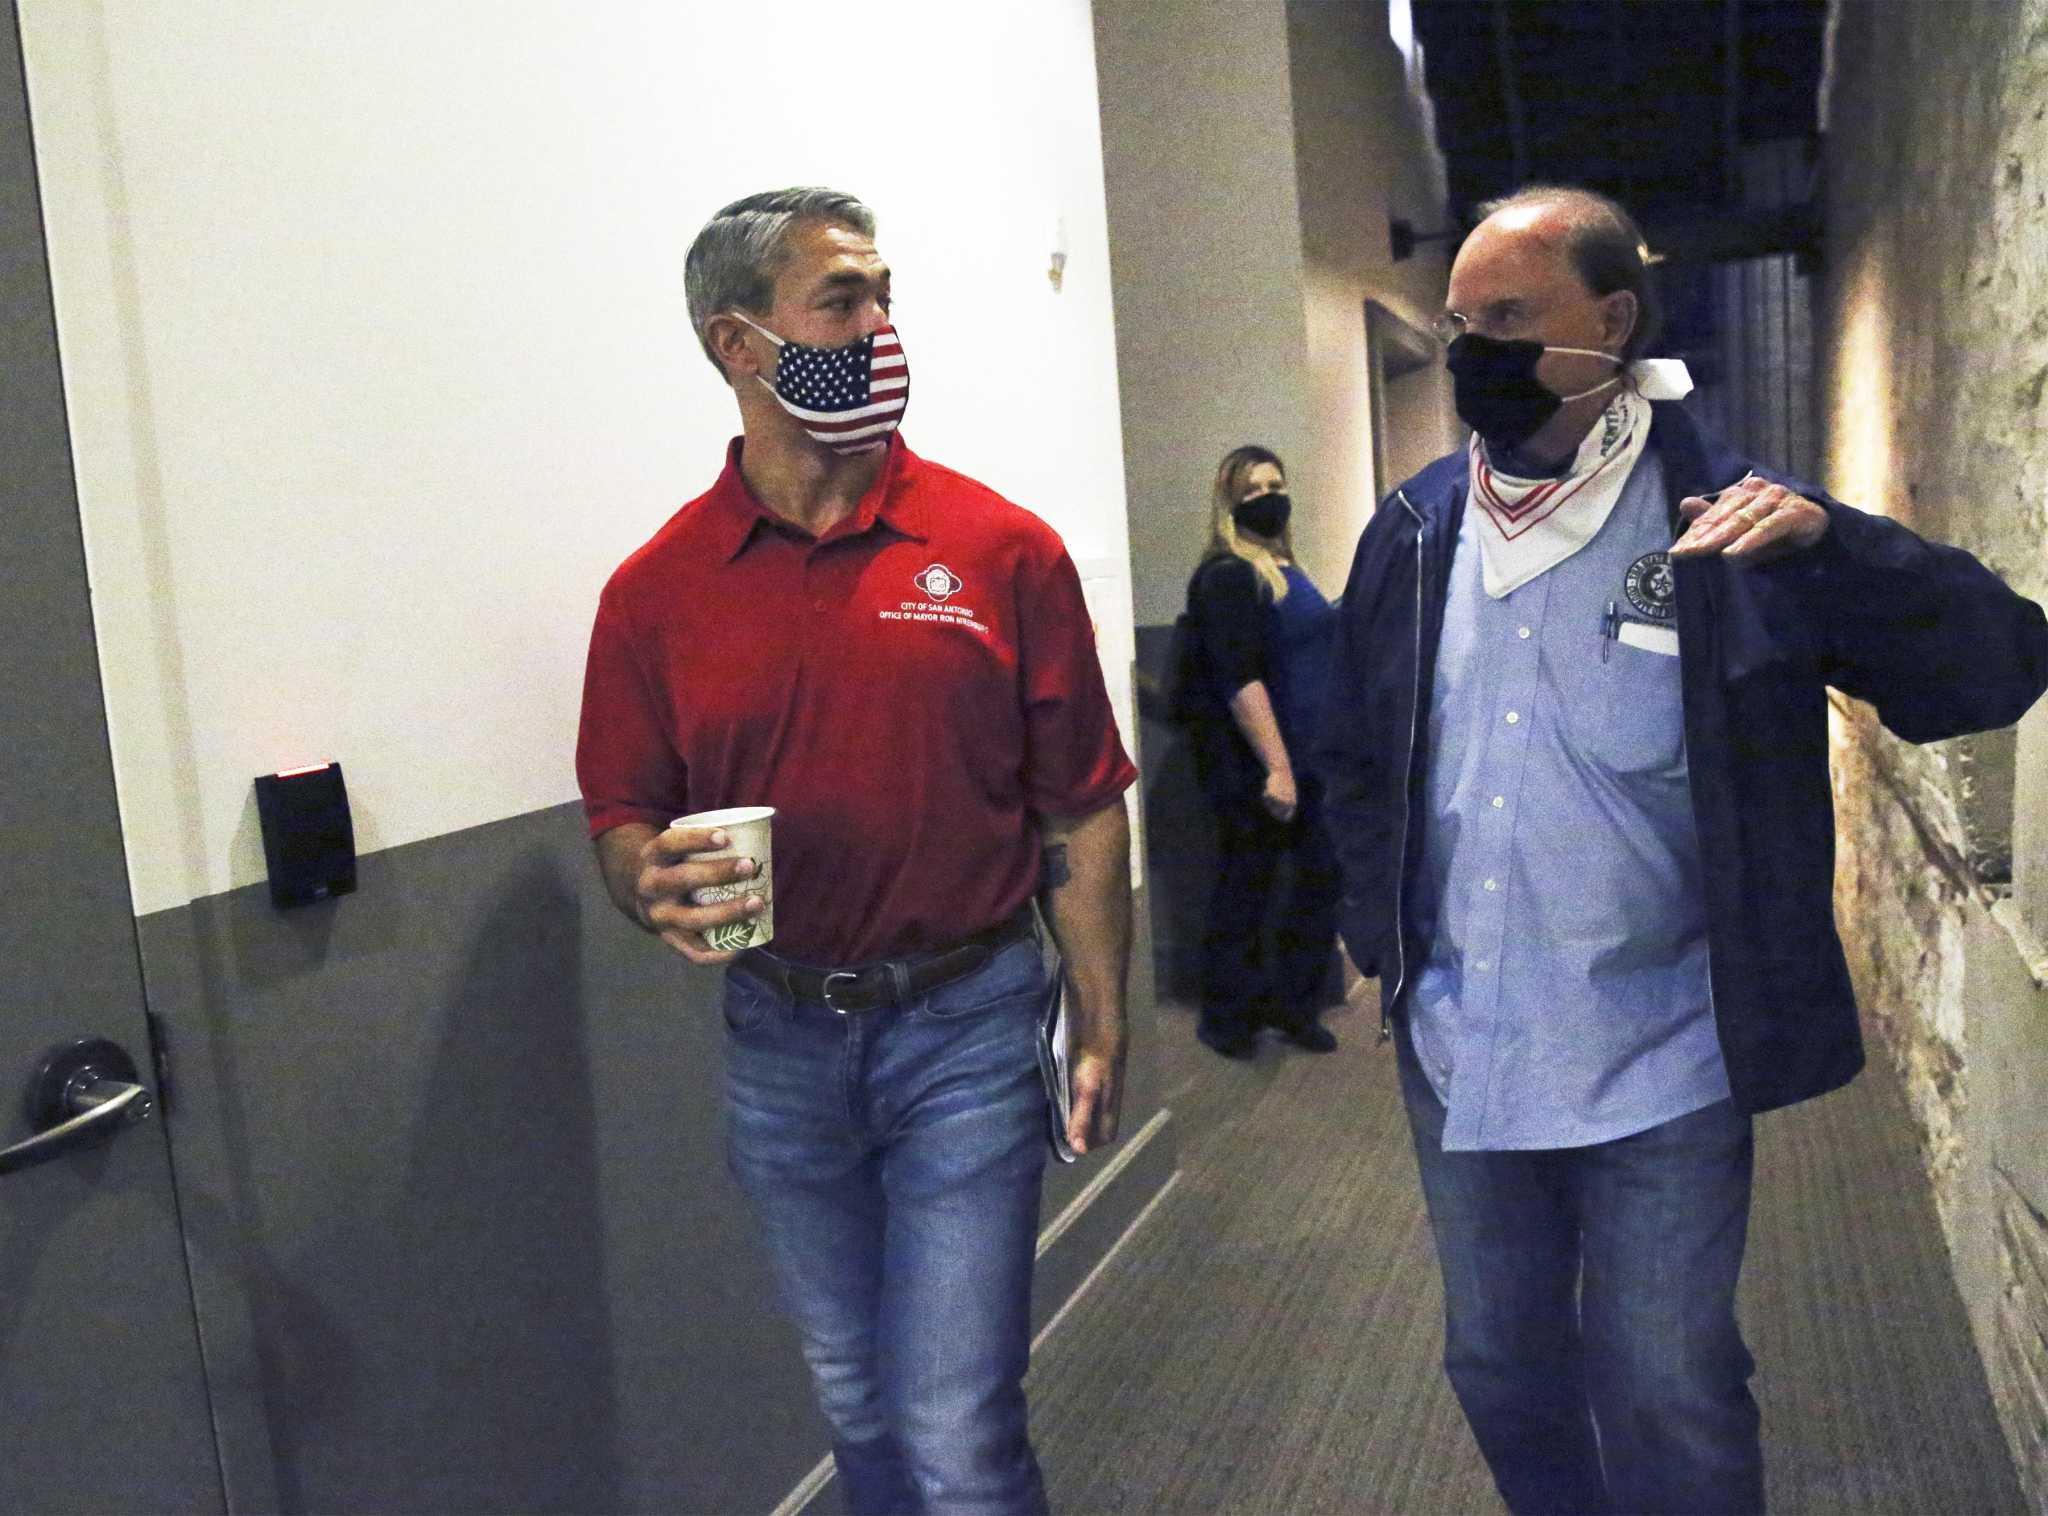 No coronavirus citations were issued after first night of San Antonio's temporary curfew